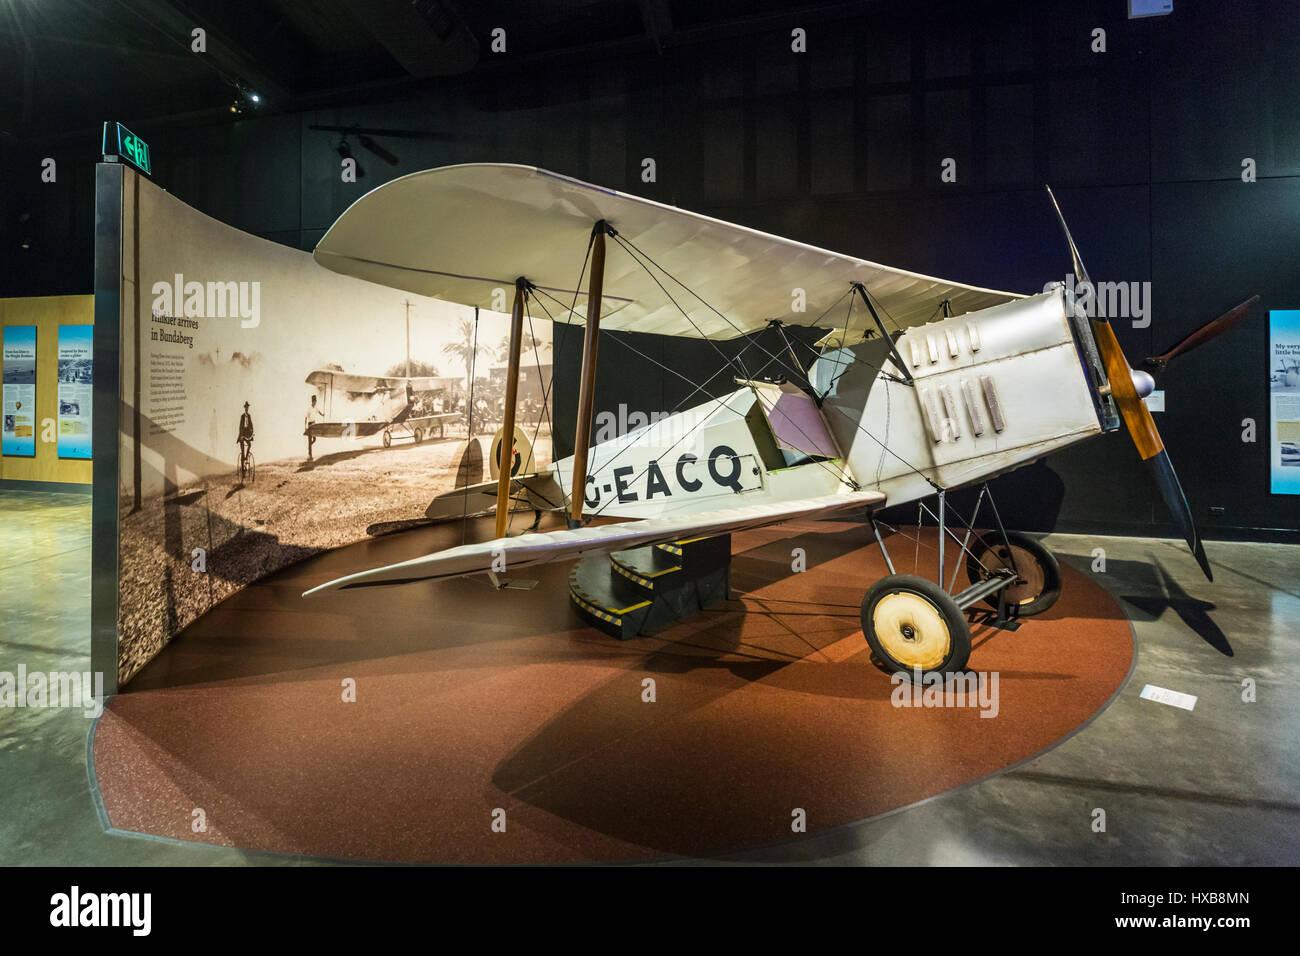 Une réplique de Bert Hinkler's Baby Avro Aircraft dans le hall de l'Aviation. Hinkler Bundaberg, Queensland, Photo Stock